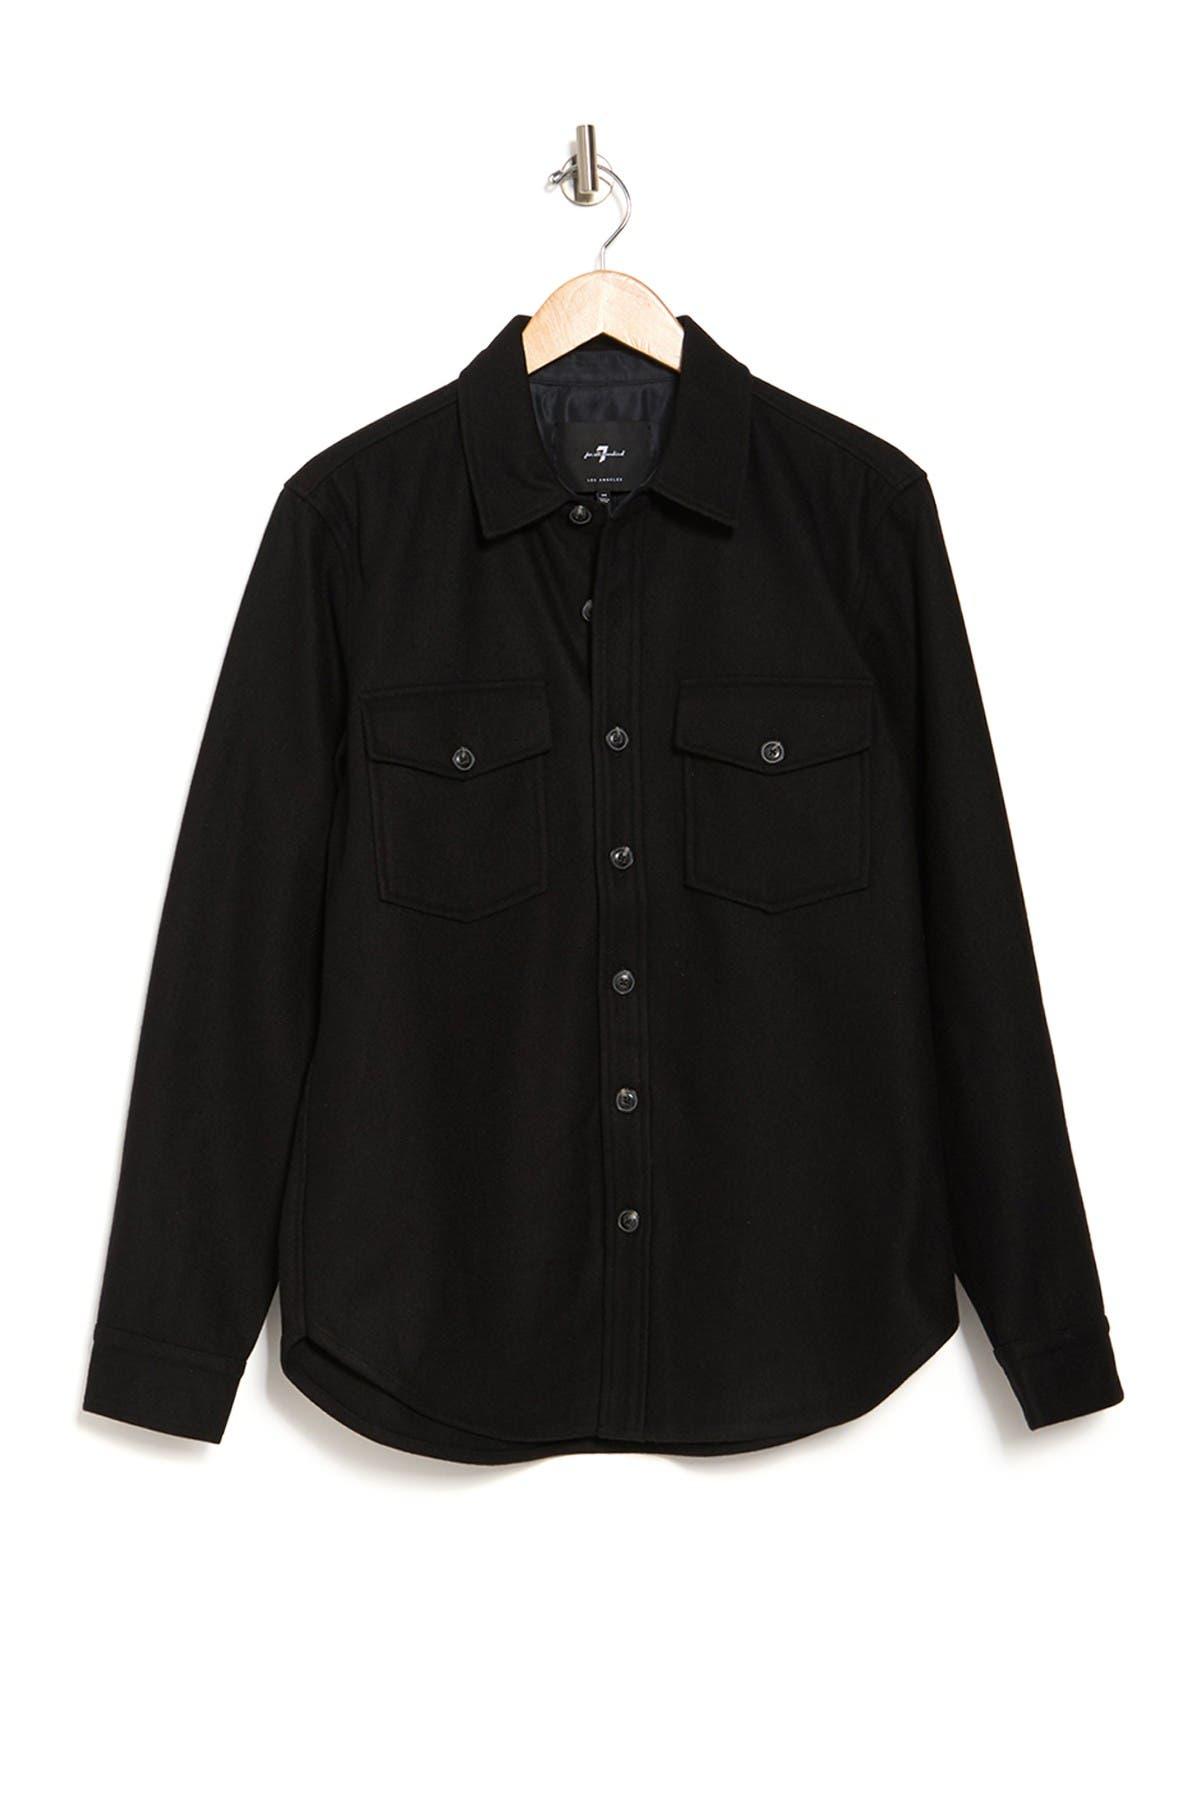 Image of 7 For All Mankind Melton Shirt Jacket